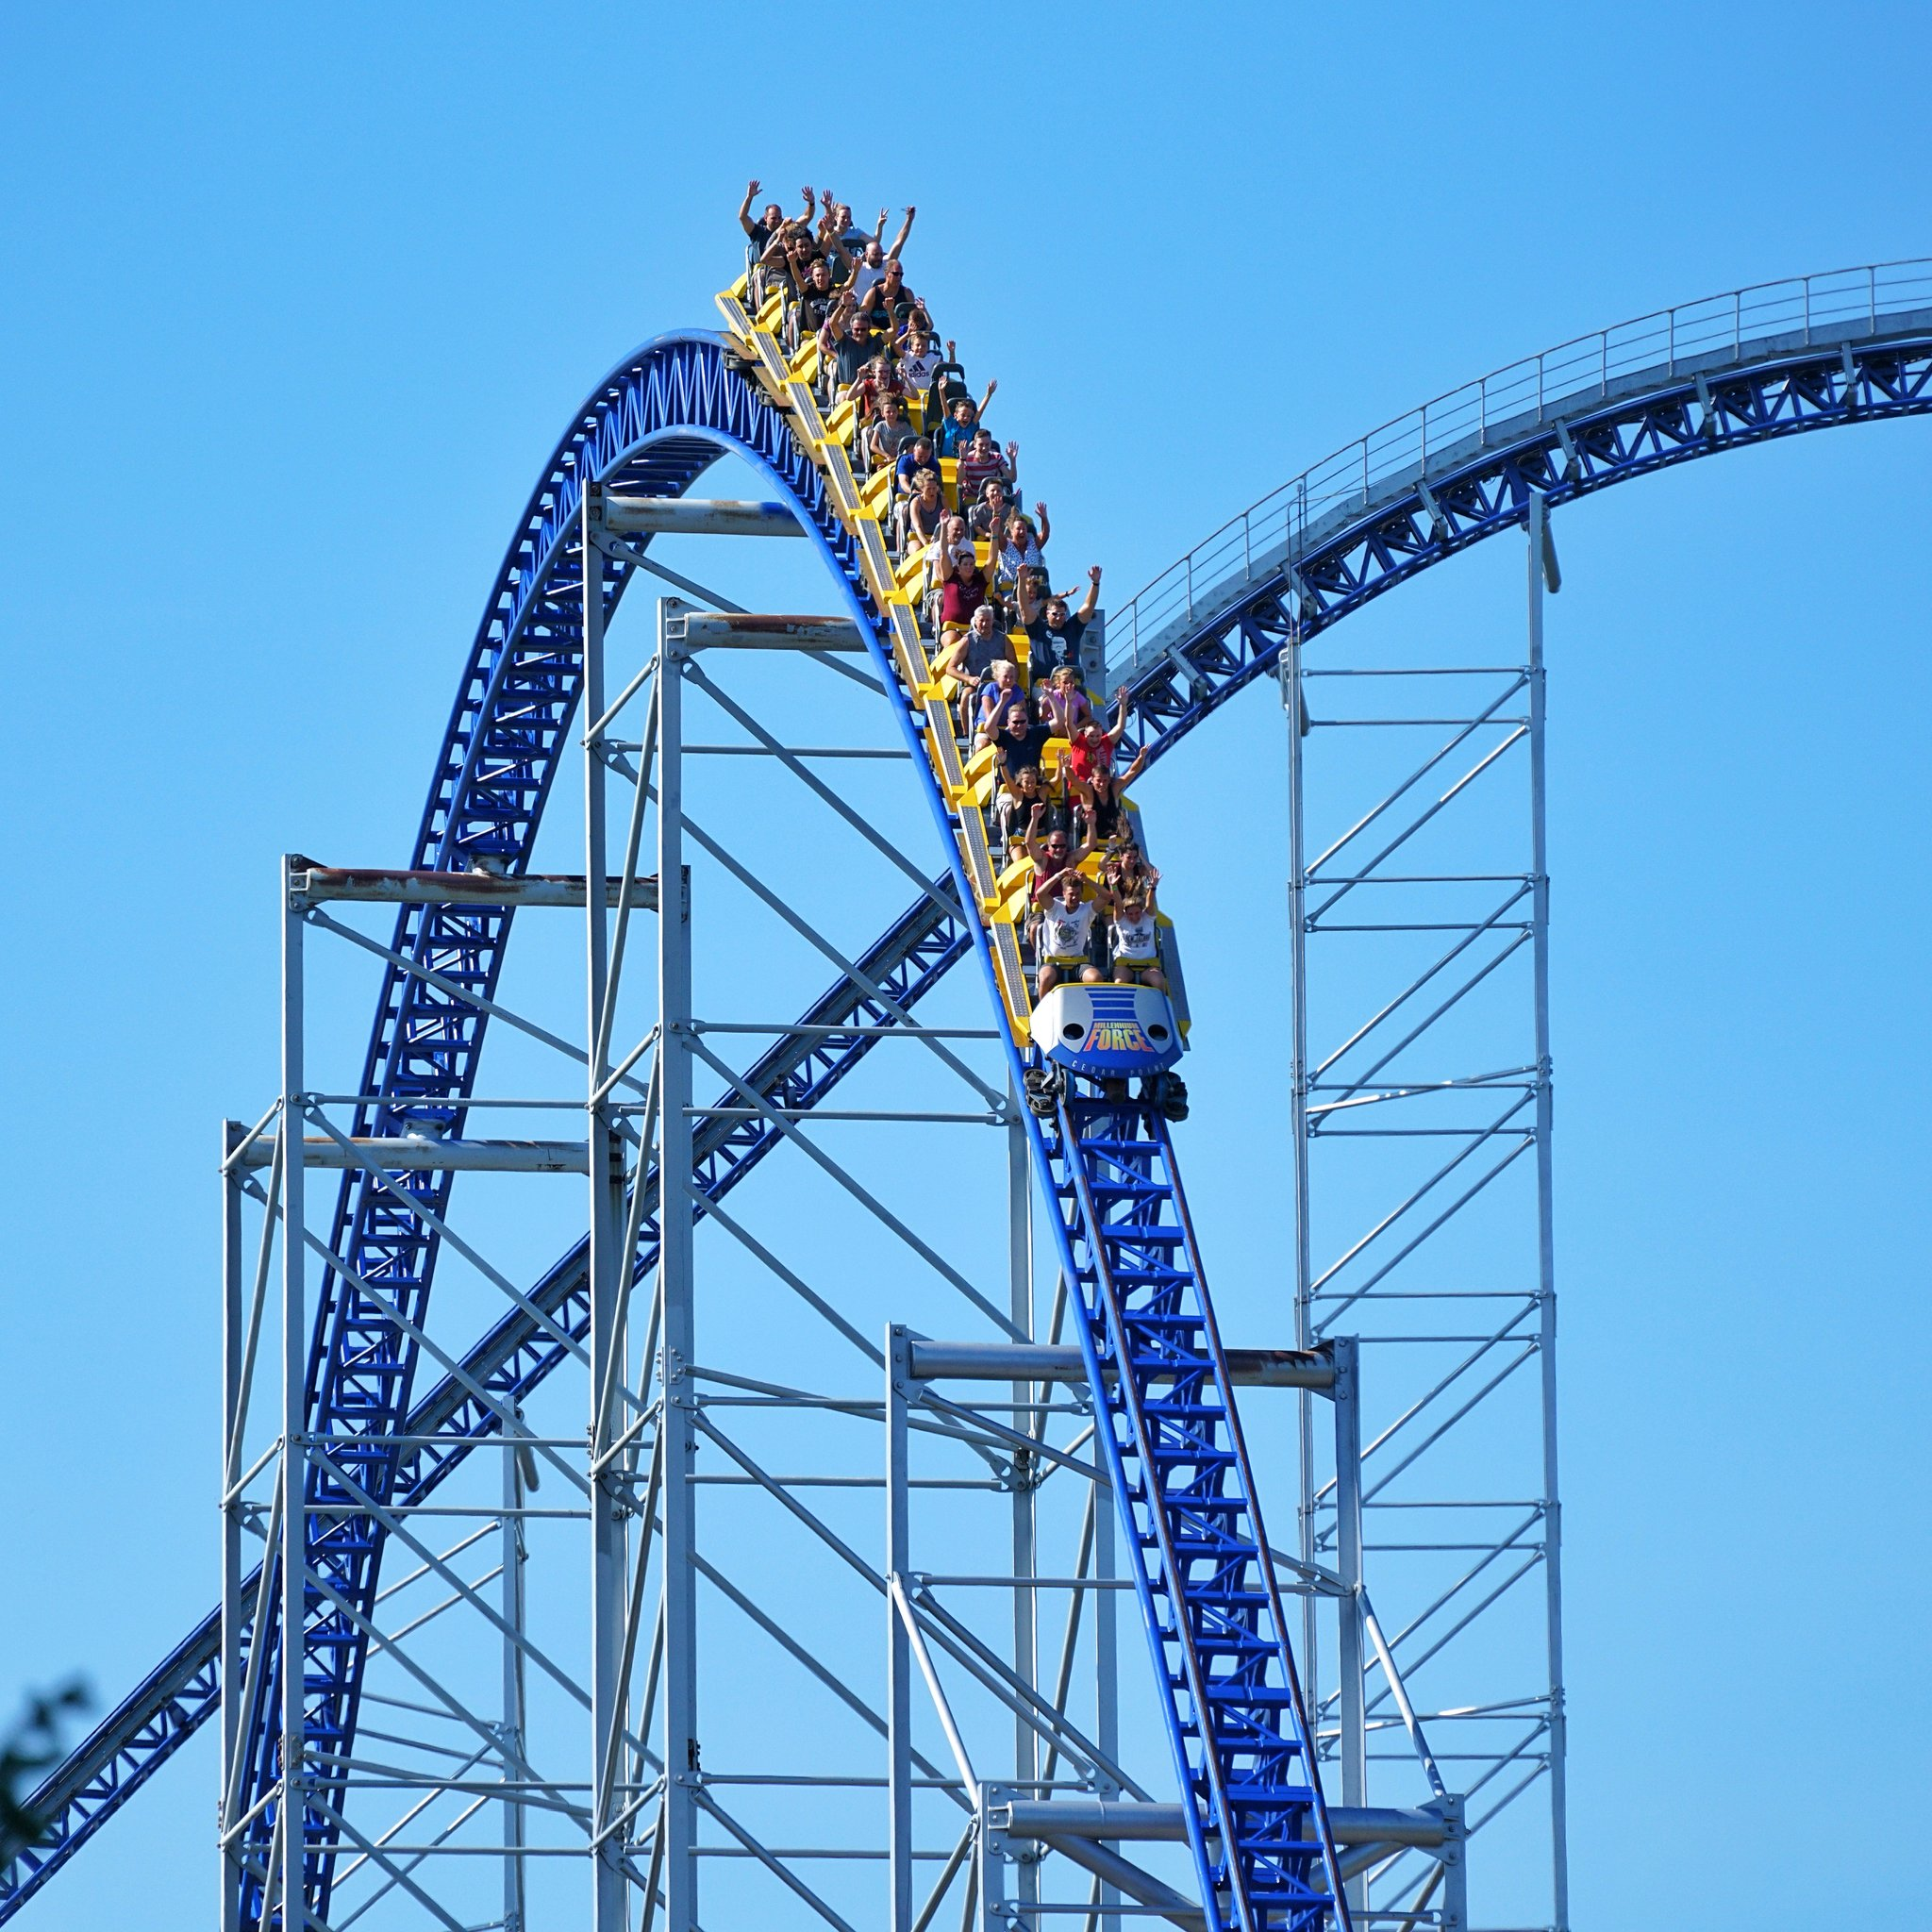 pac man roller coaster